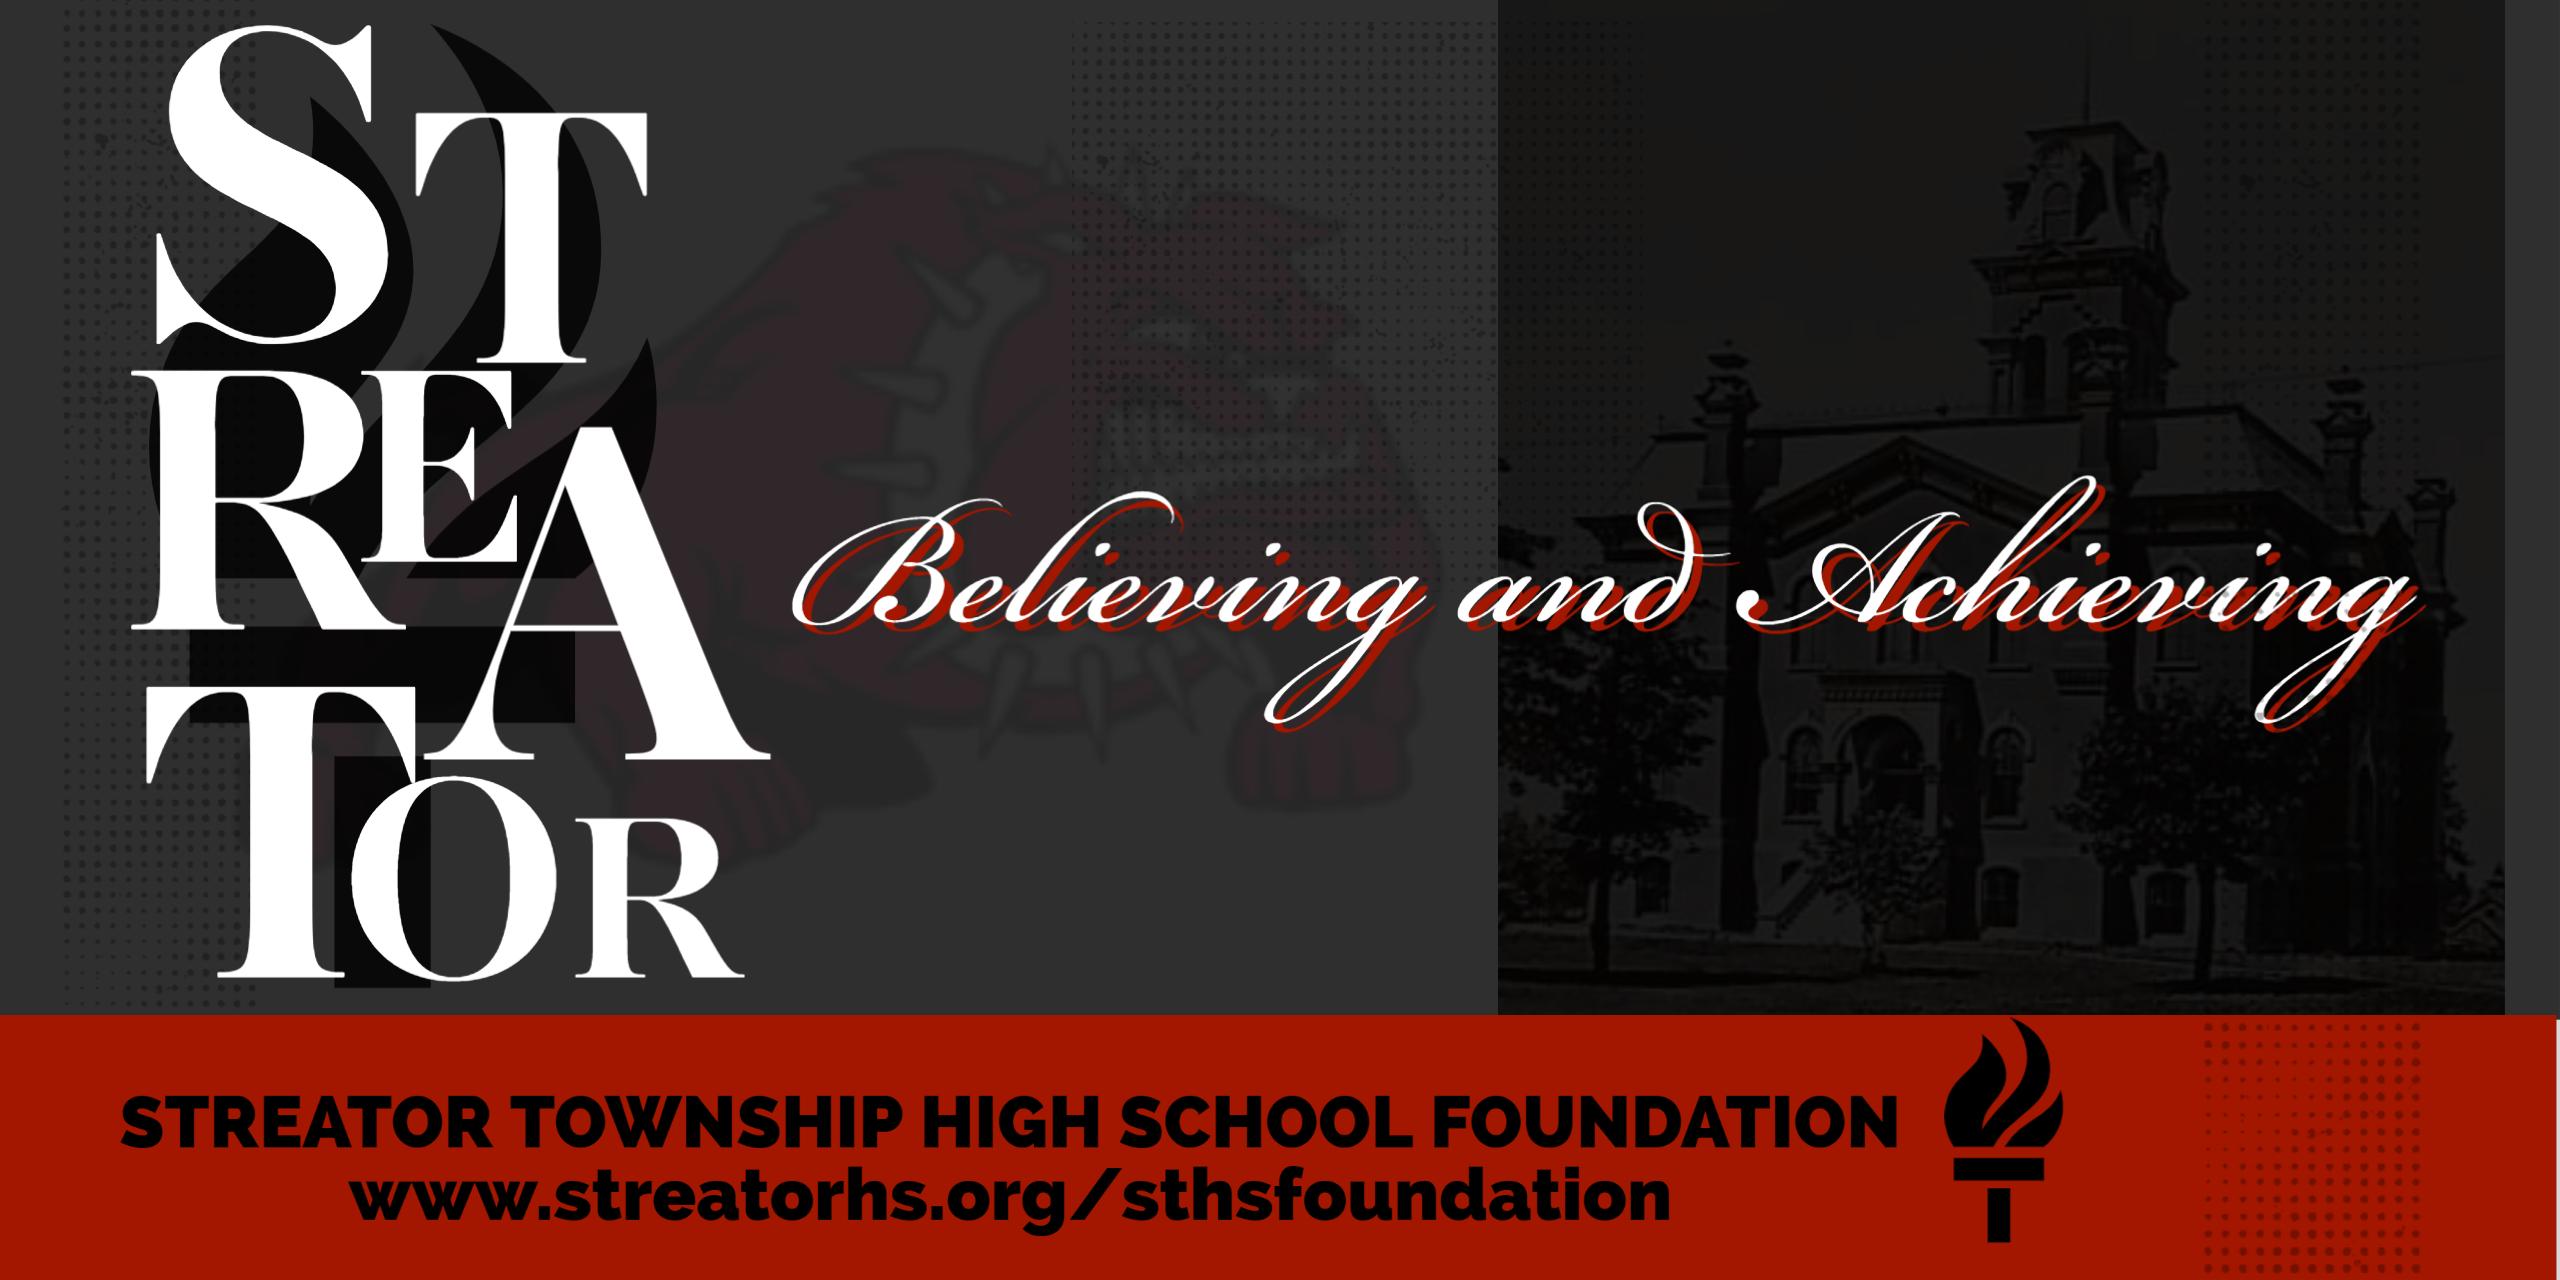 Streator Township High School Foundation